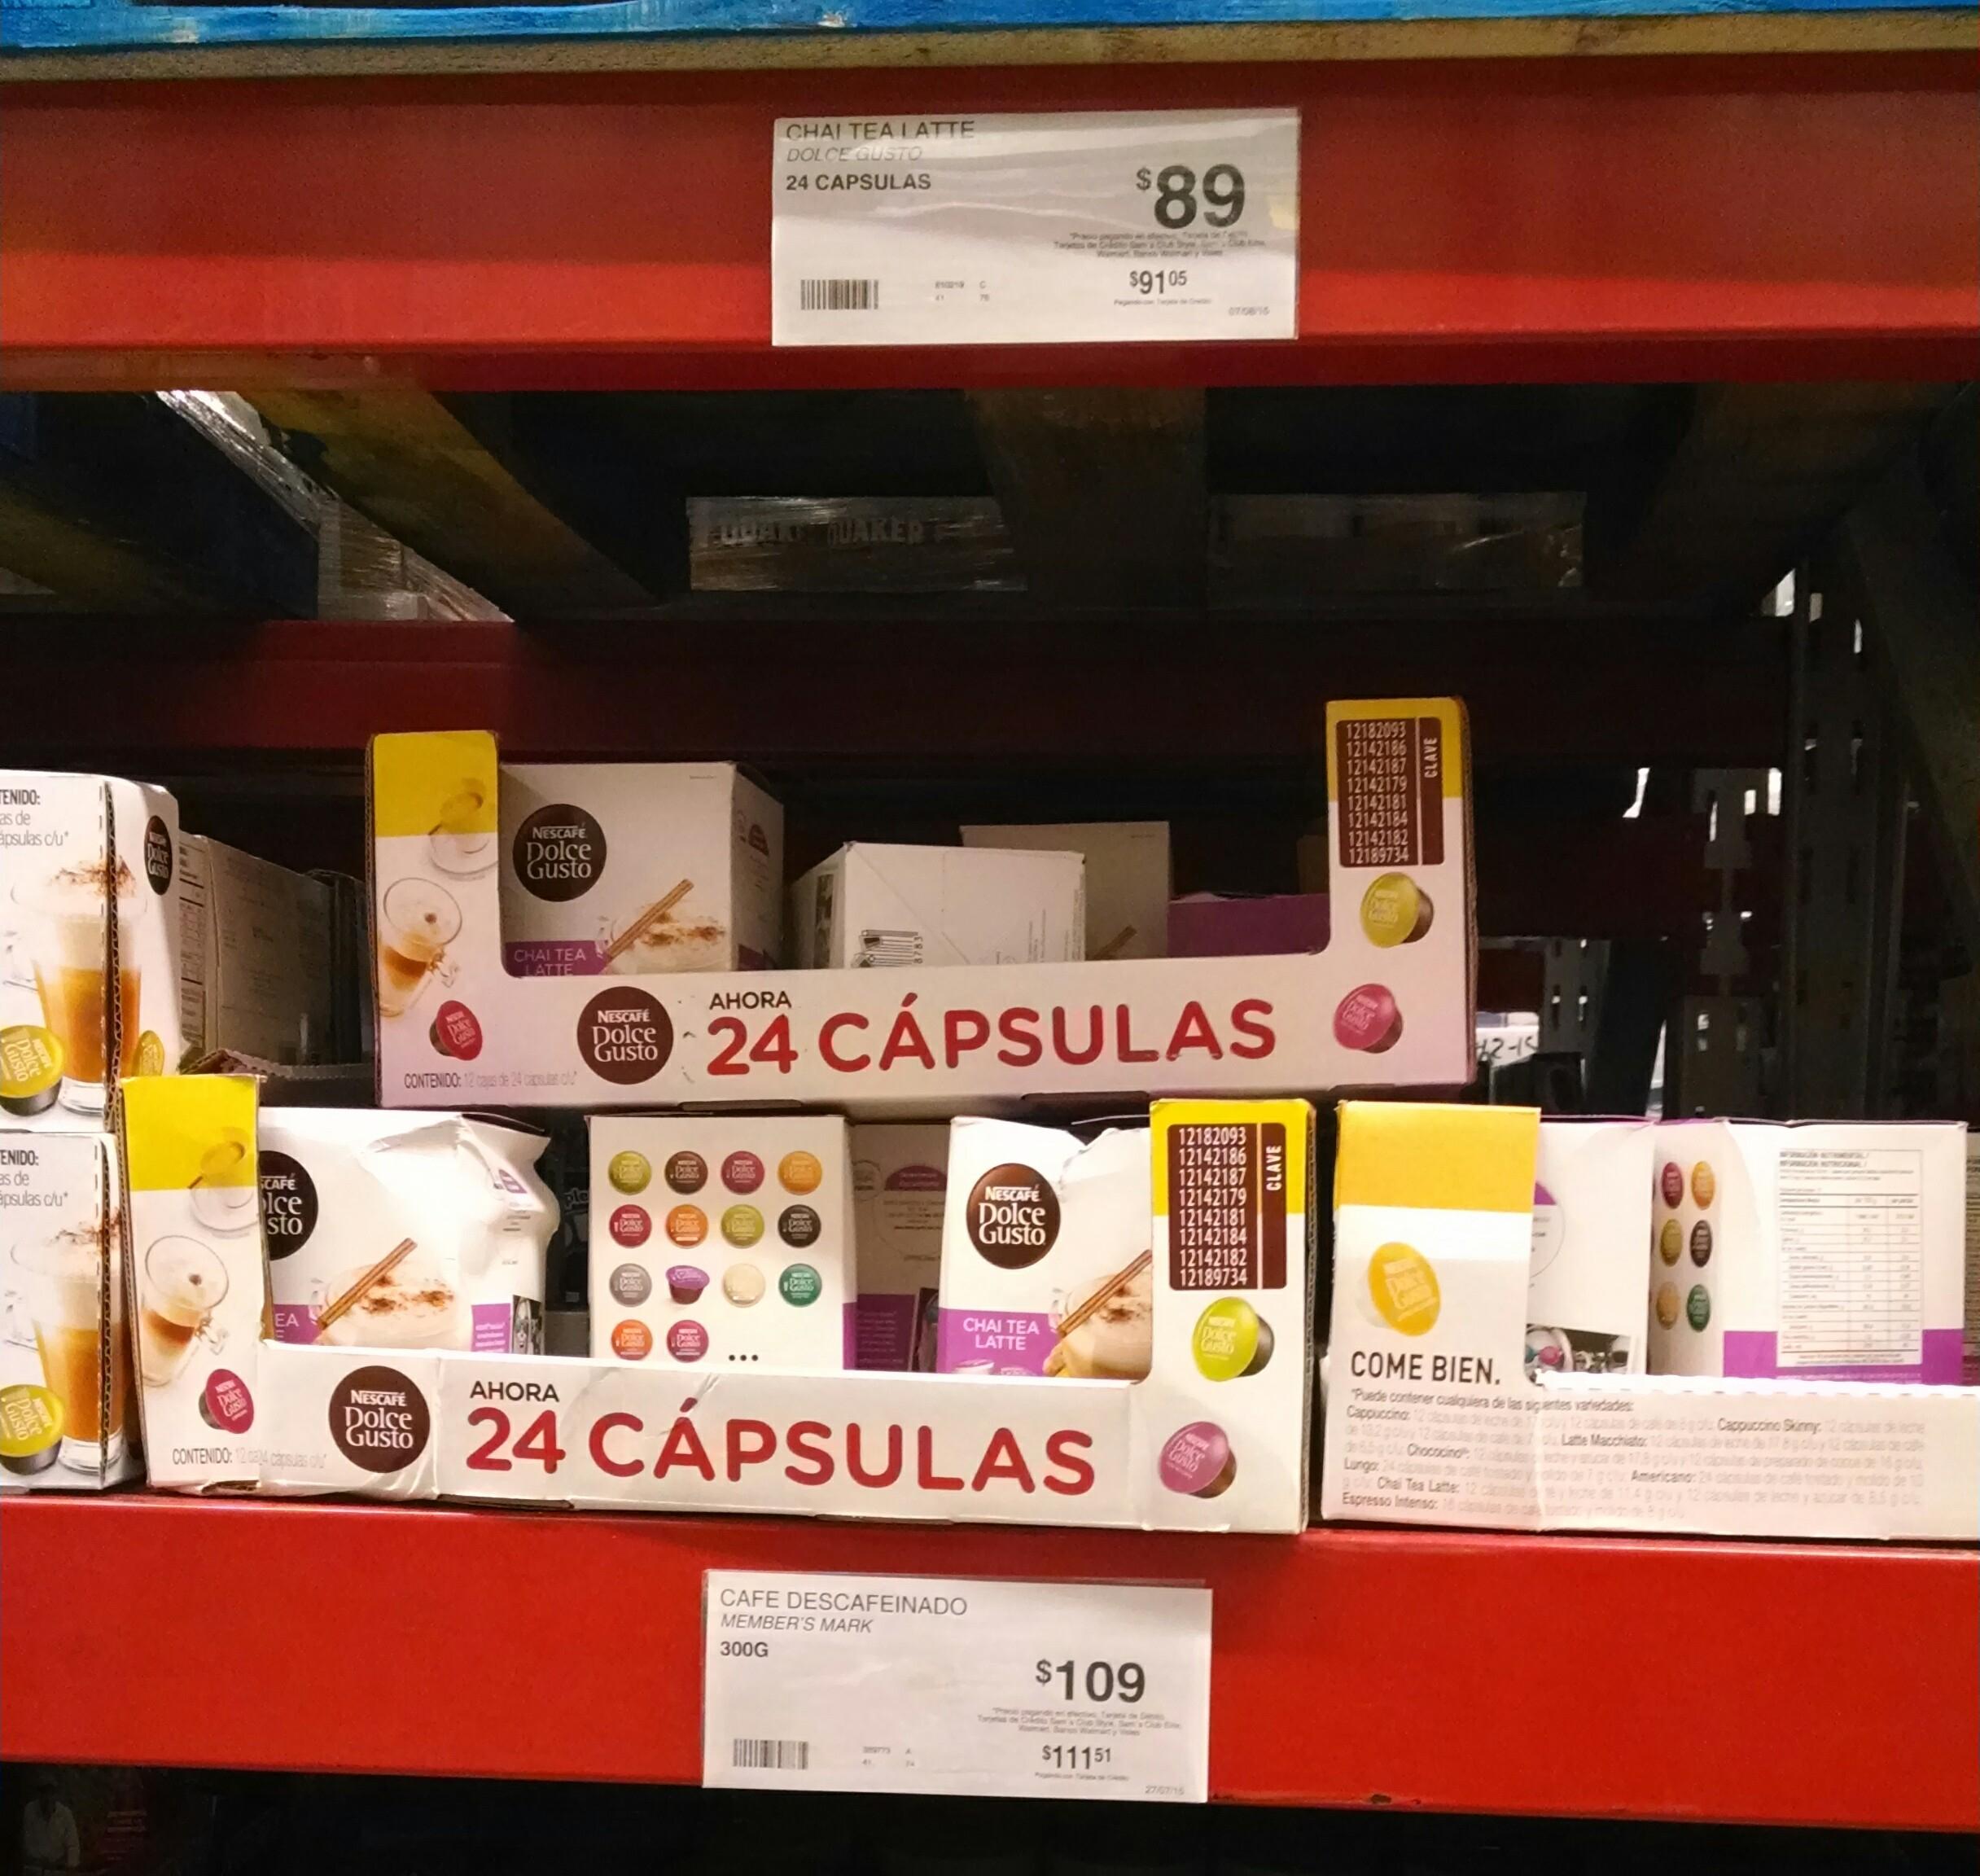 Sam's Club: 24 cápsulas dolce gusto chai tea late a $89